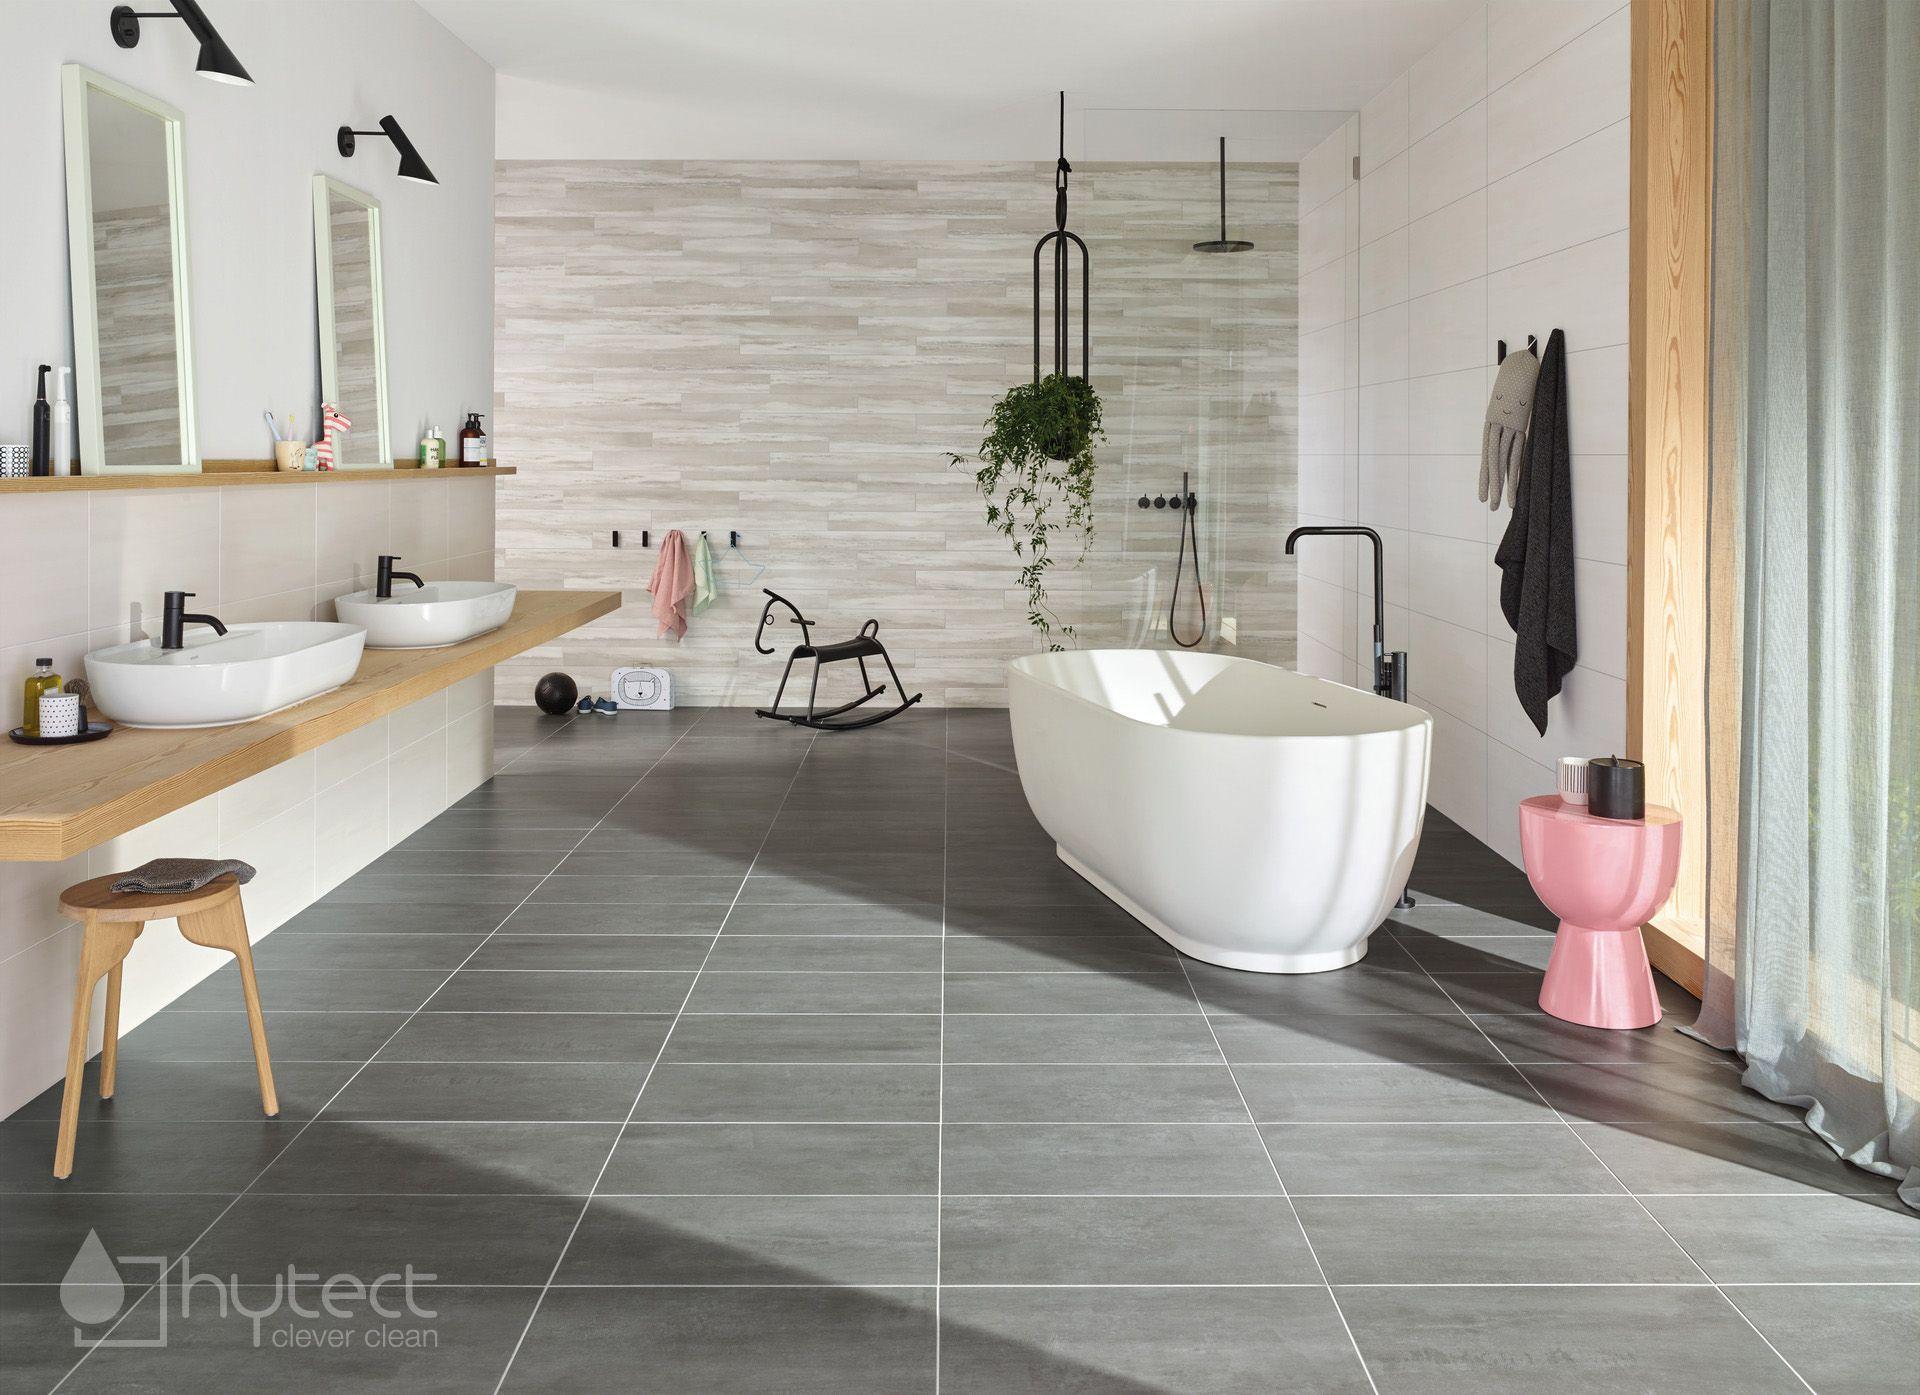 Badezimmer Ideen Grosses Familienbad Edle Marmoroptik Schwarze Armaturen Badezimmer Familienbad Badezimmerideen